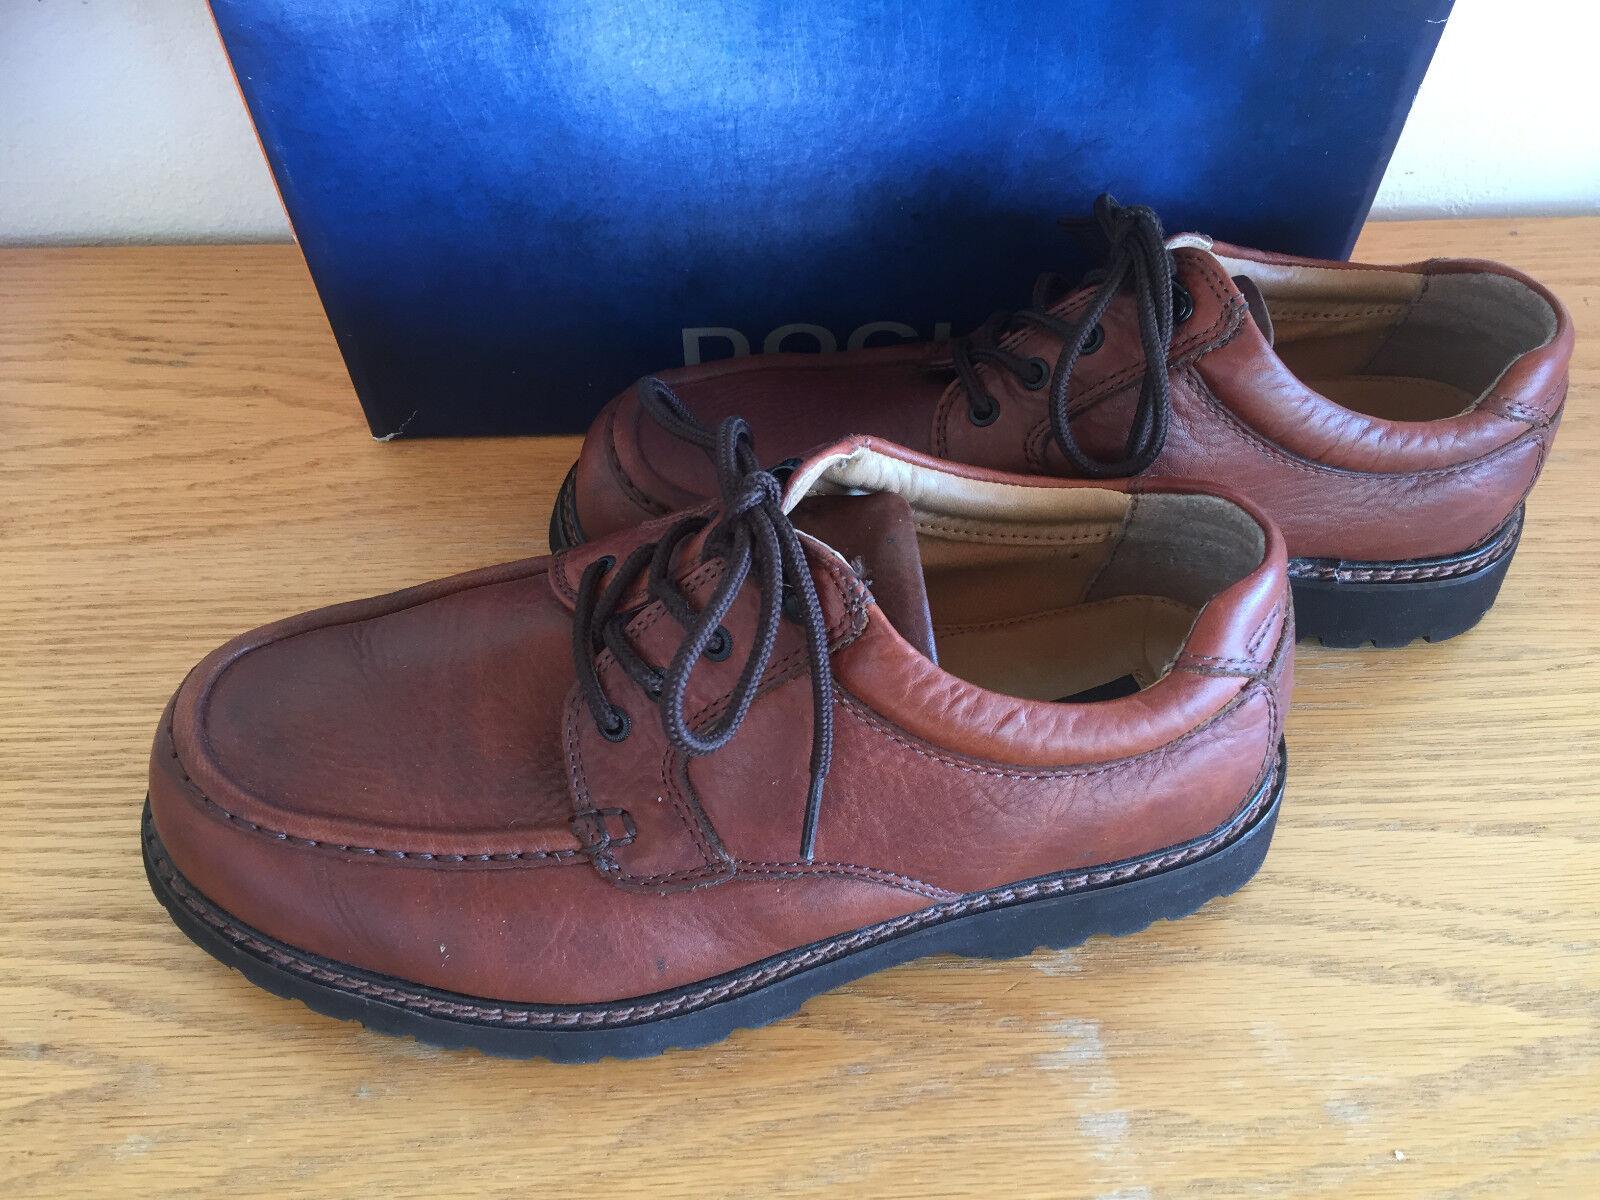 Dockers Glacier Dark Tan Boat shoes Stain Defender 90-6702 Mens 10 1 2 W